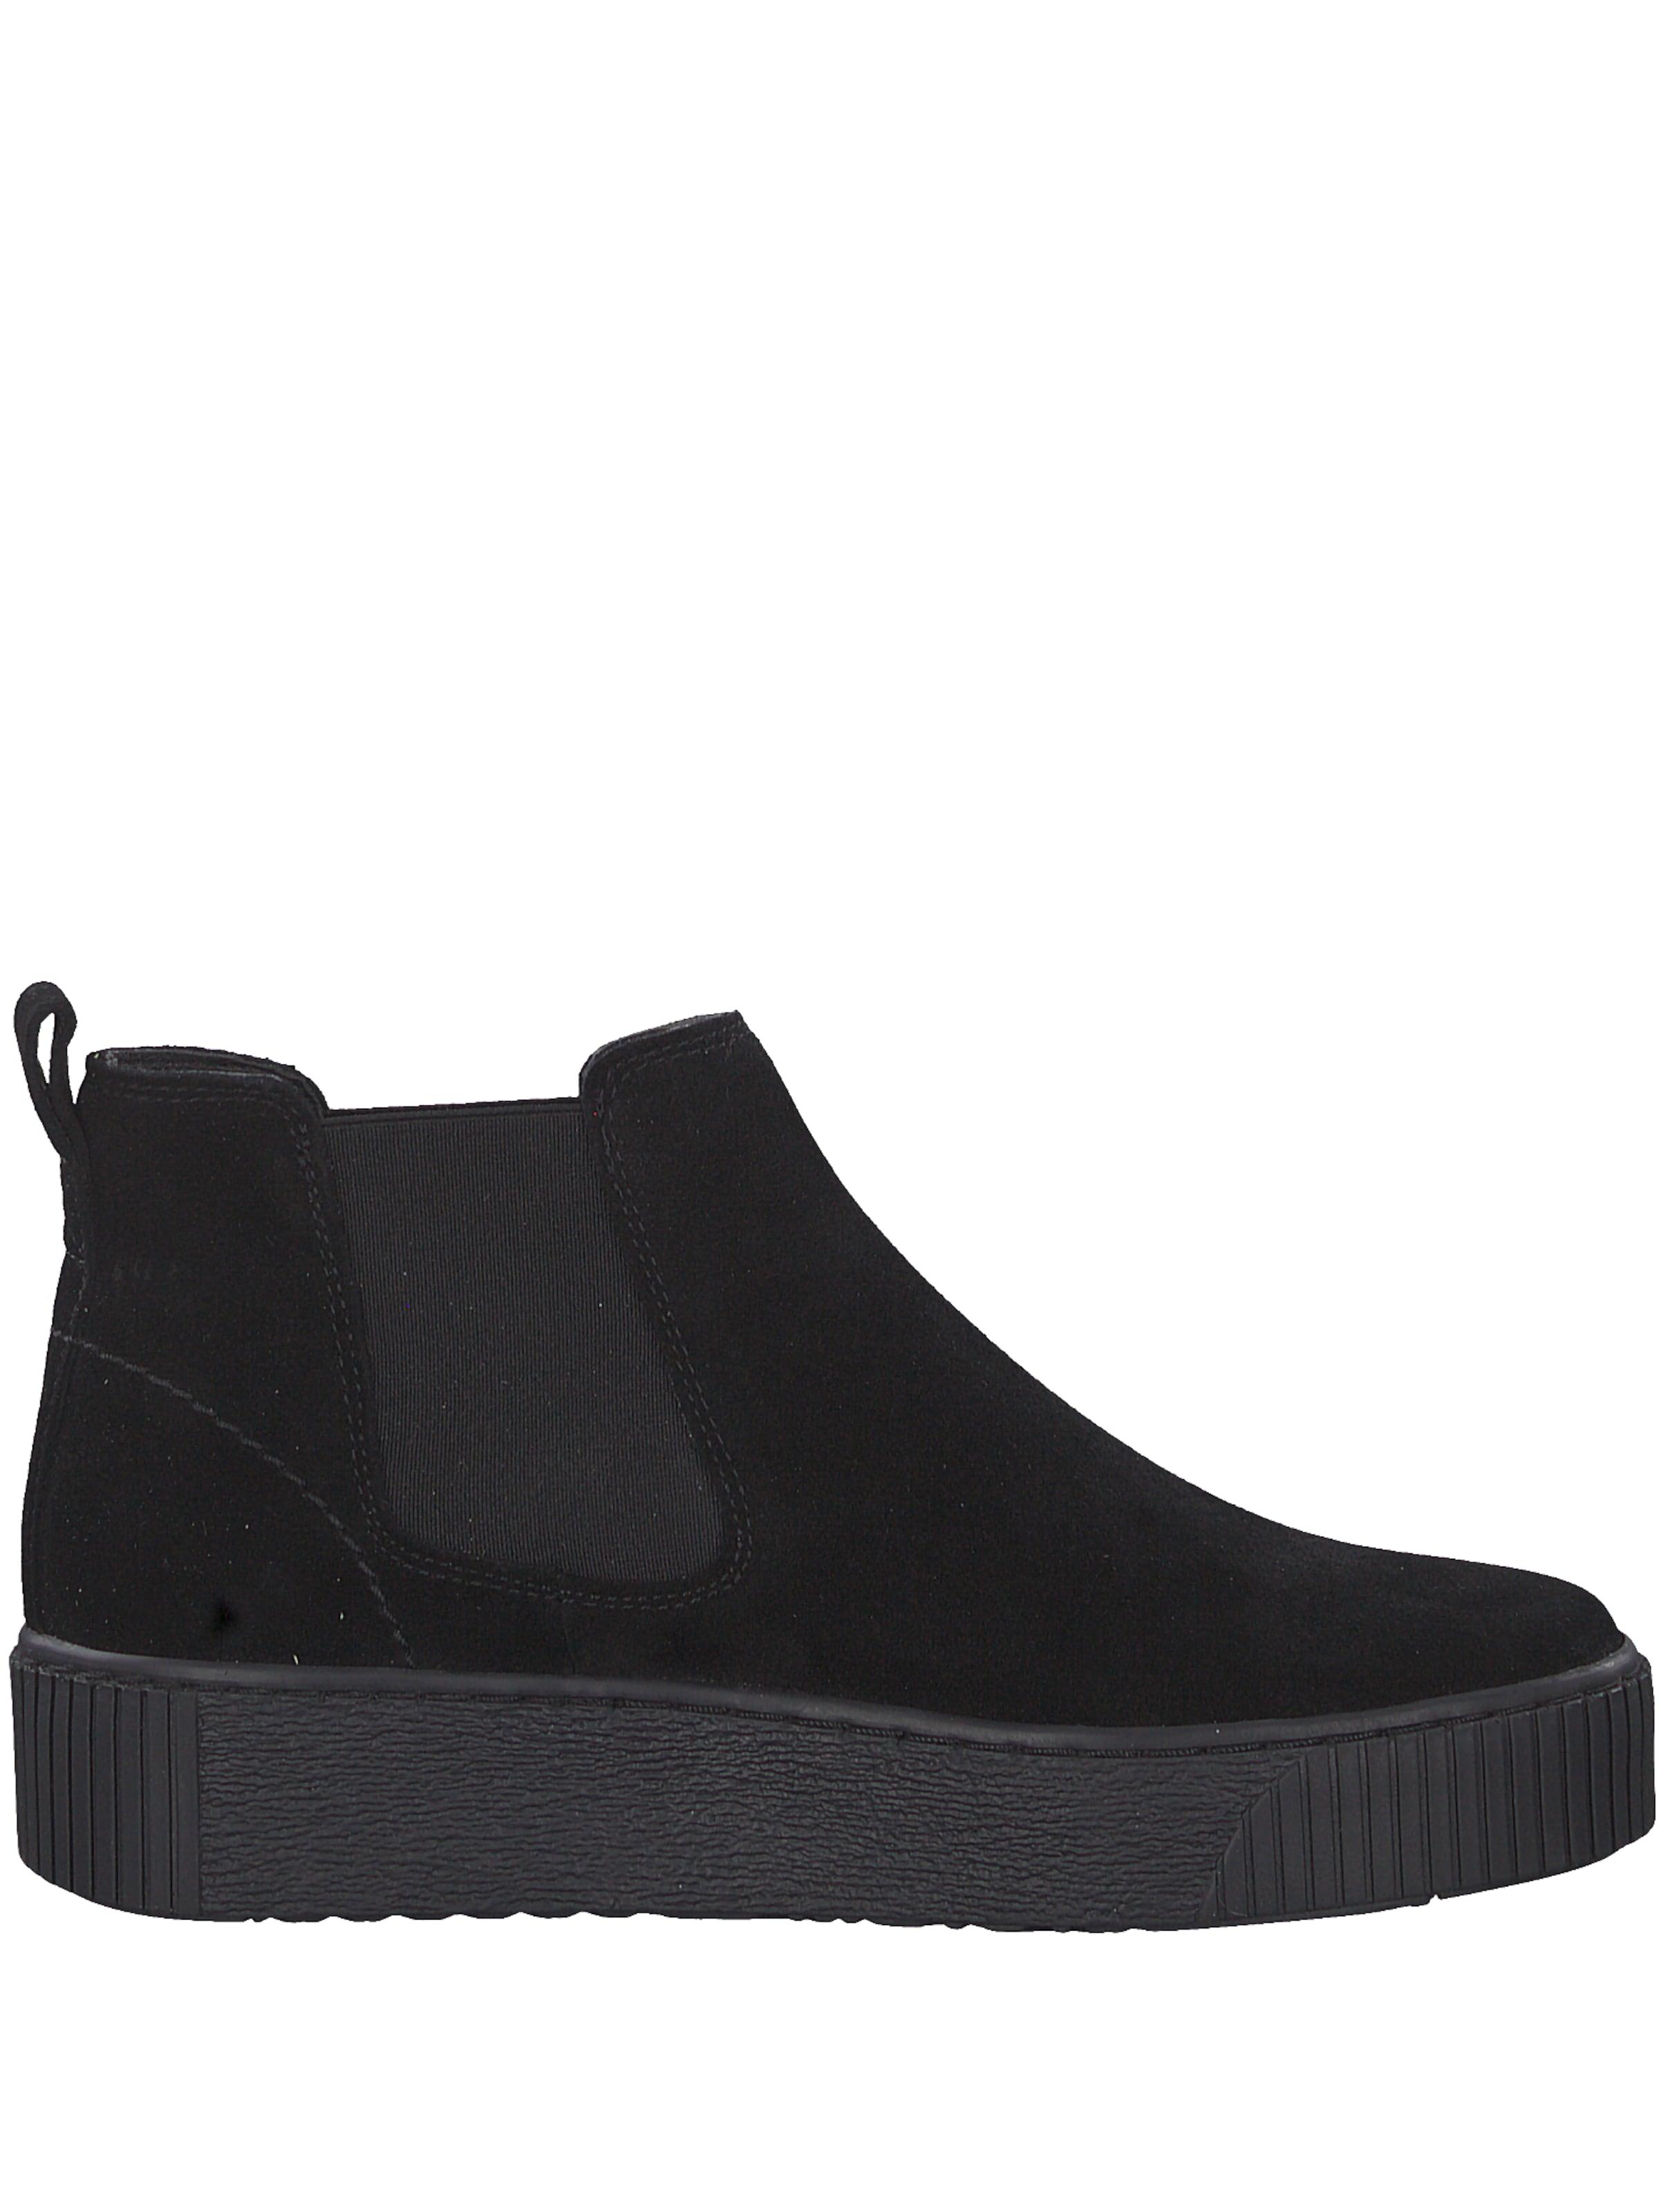 Tamaris En Chelsea En Boots Noir Chelsea Tamaris Boots R54AjL